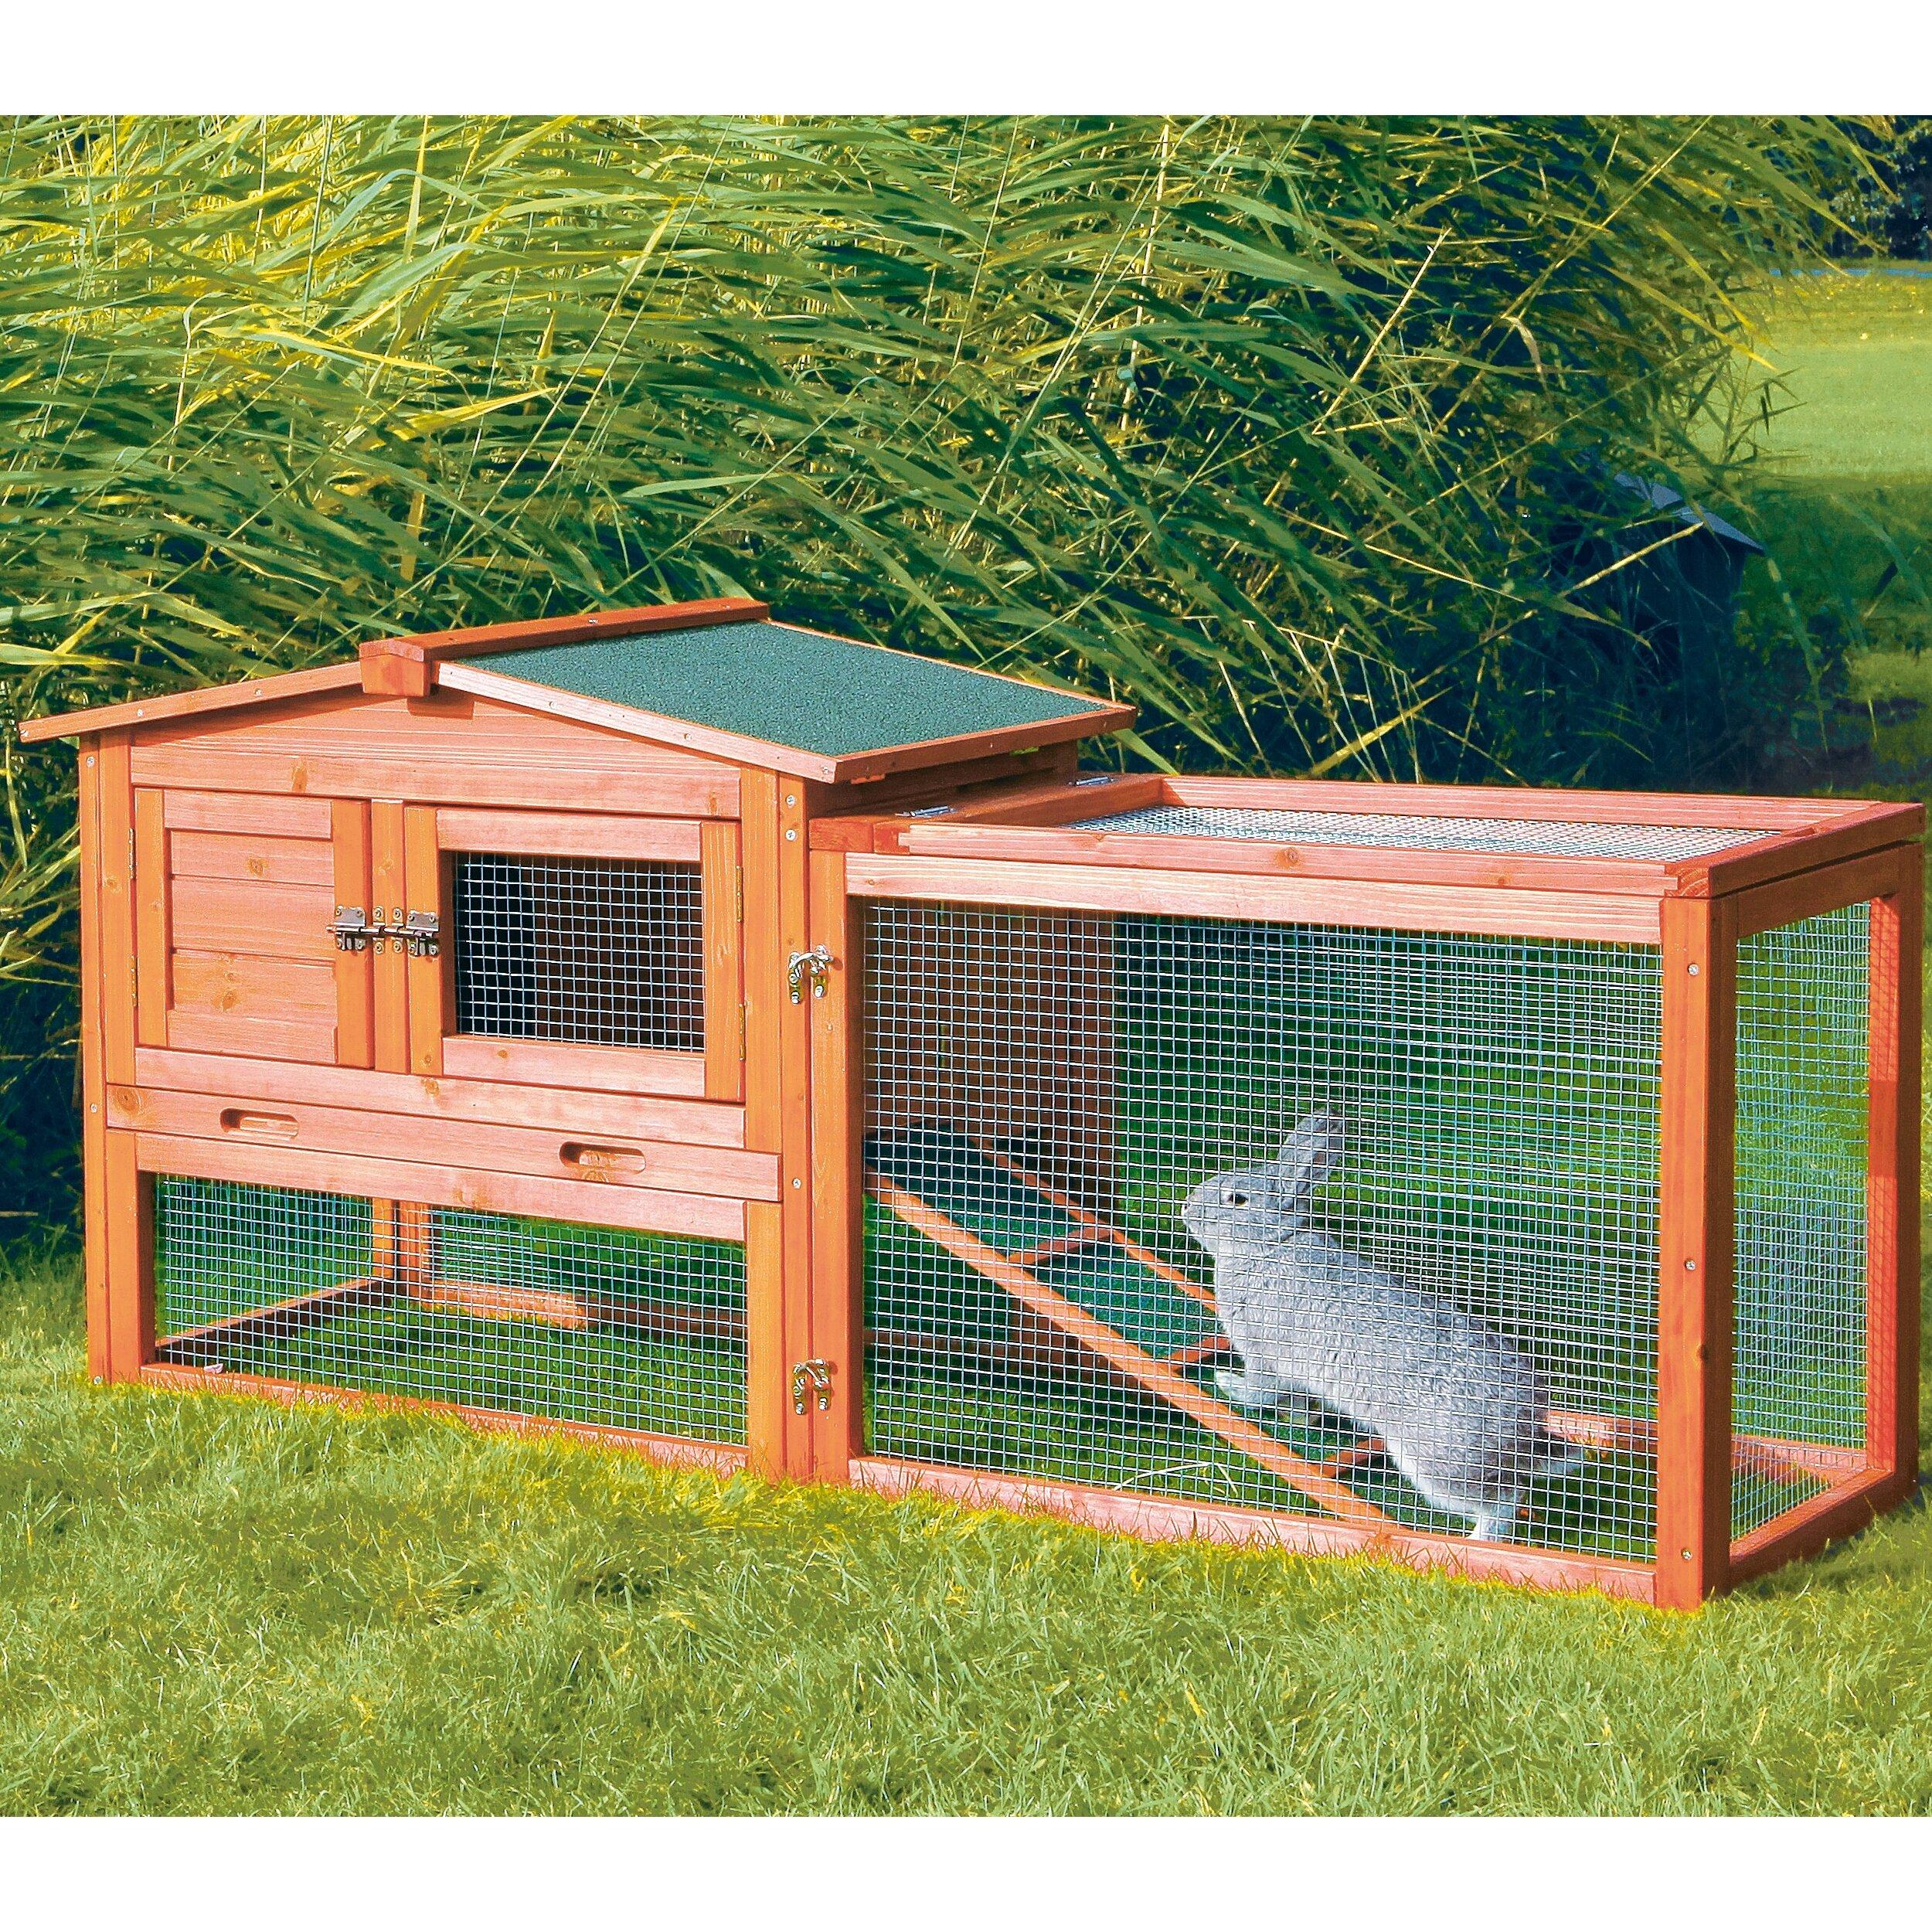 cfm wood boomer solid product george hayneedle hutch master rabbit white wash boomergeorgegraywashrabbithutch